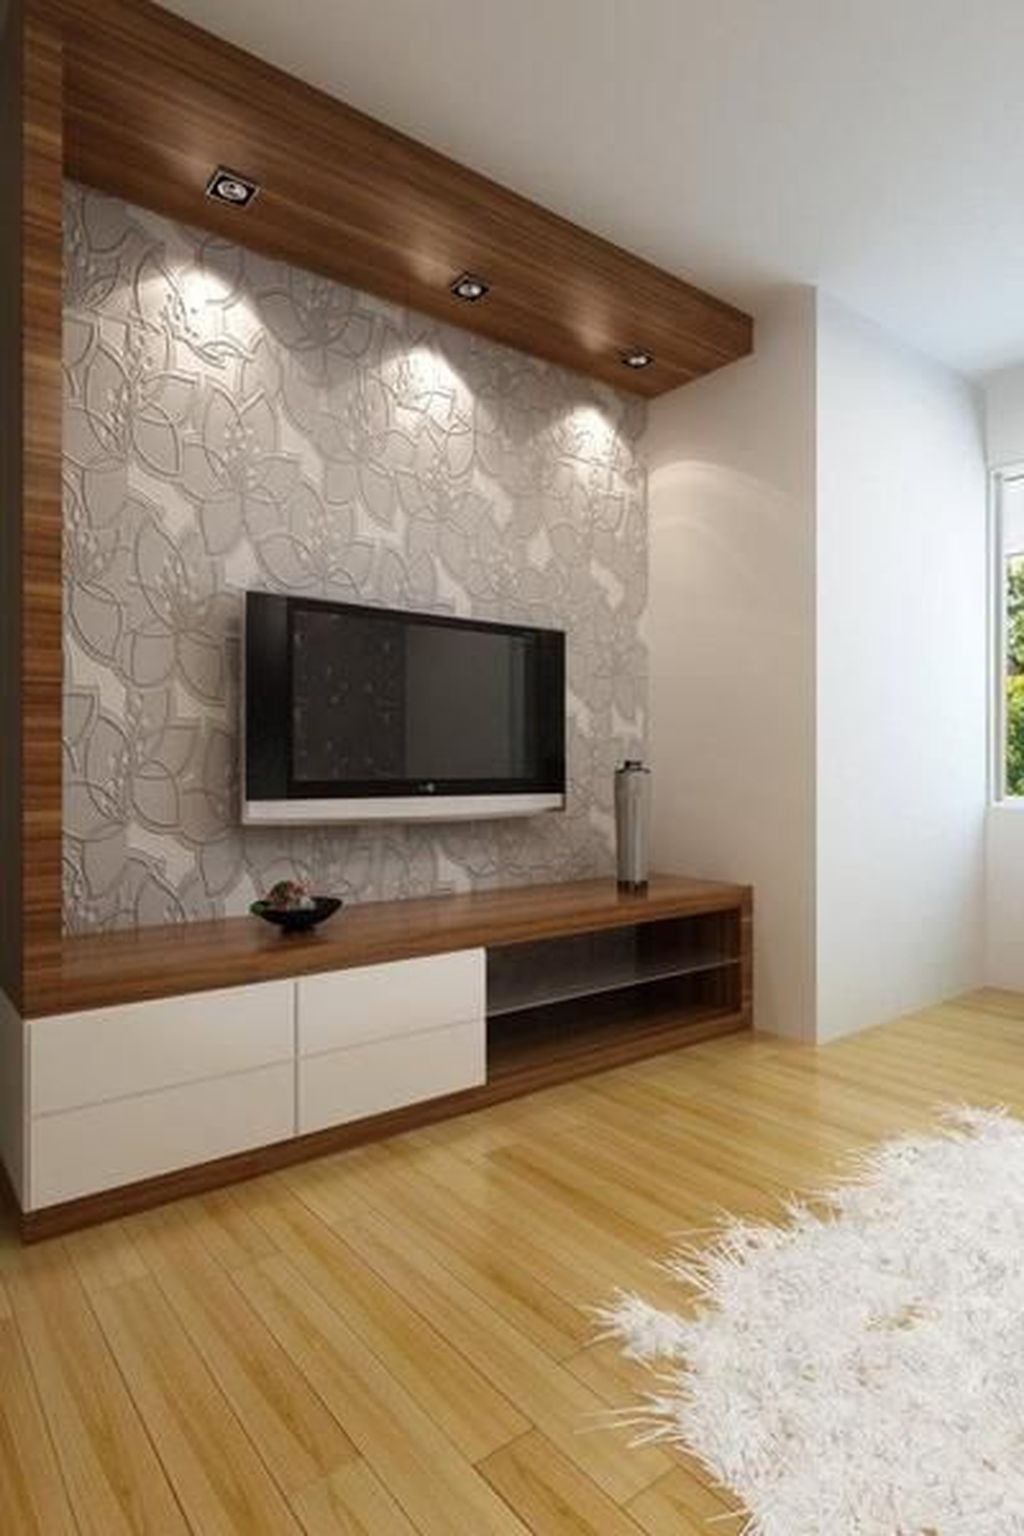 46 Cool Bedroom Tv Wall Design Ideas Bedroom Tv Wall Wall Unit Designs Modern Tv Wall Units